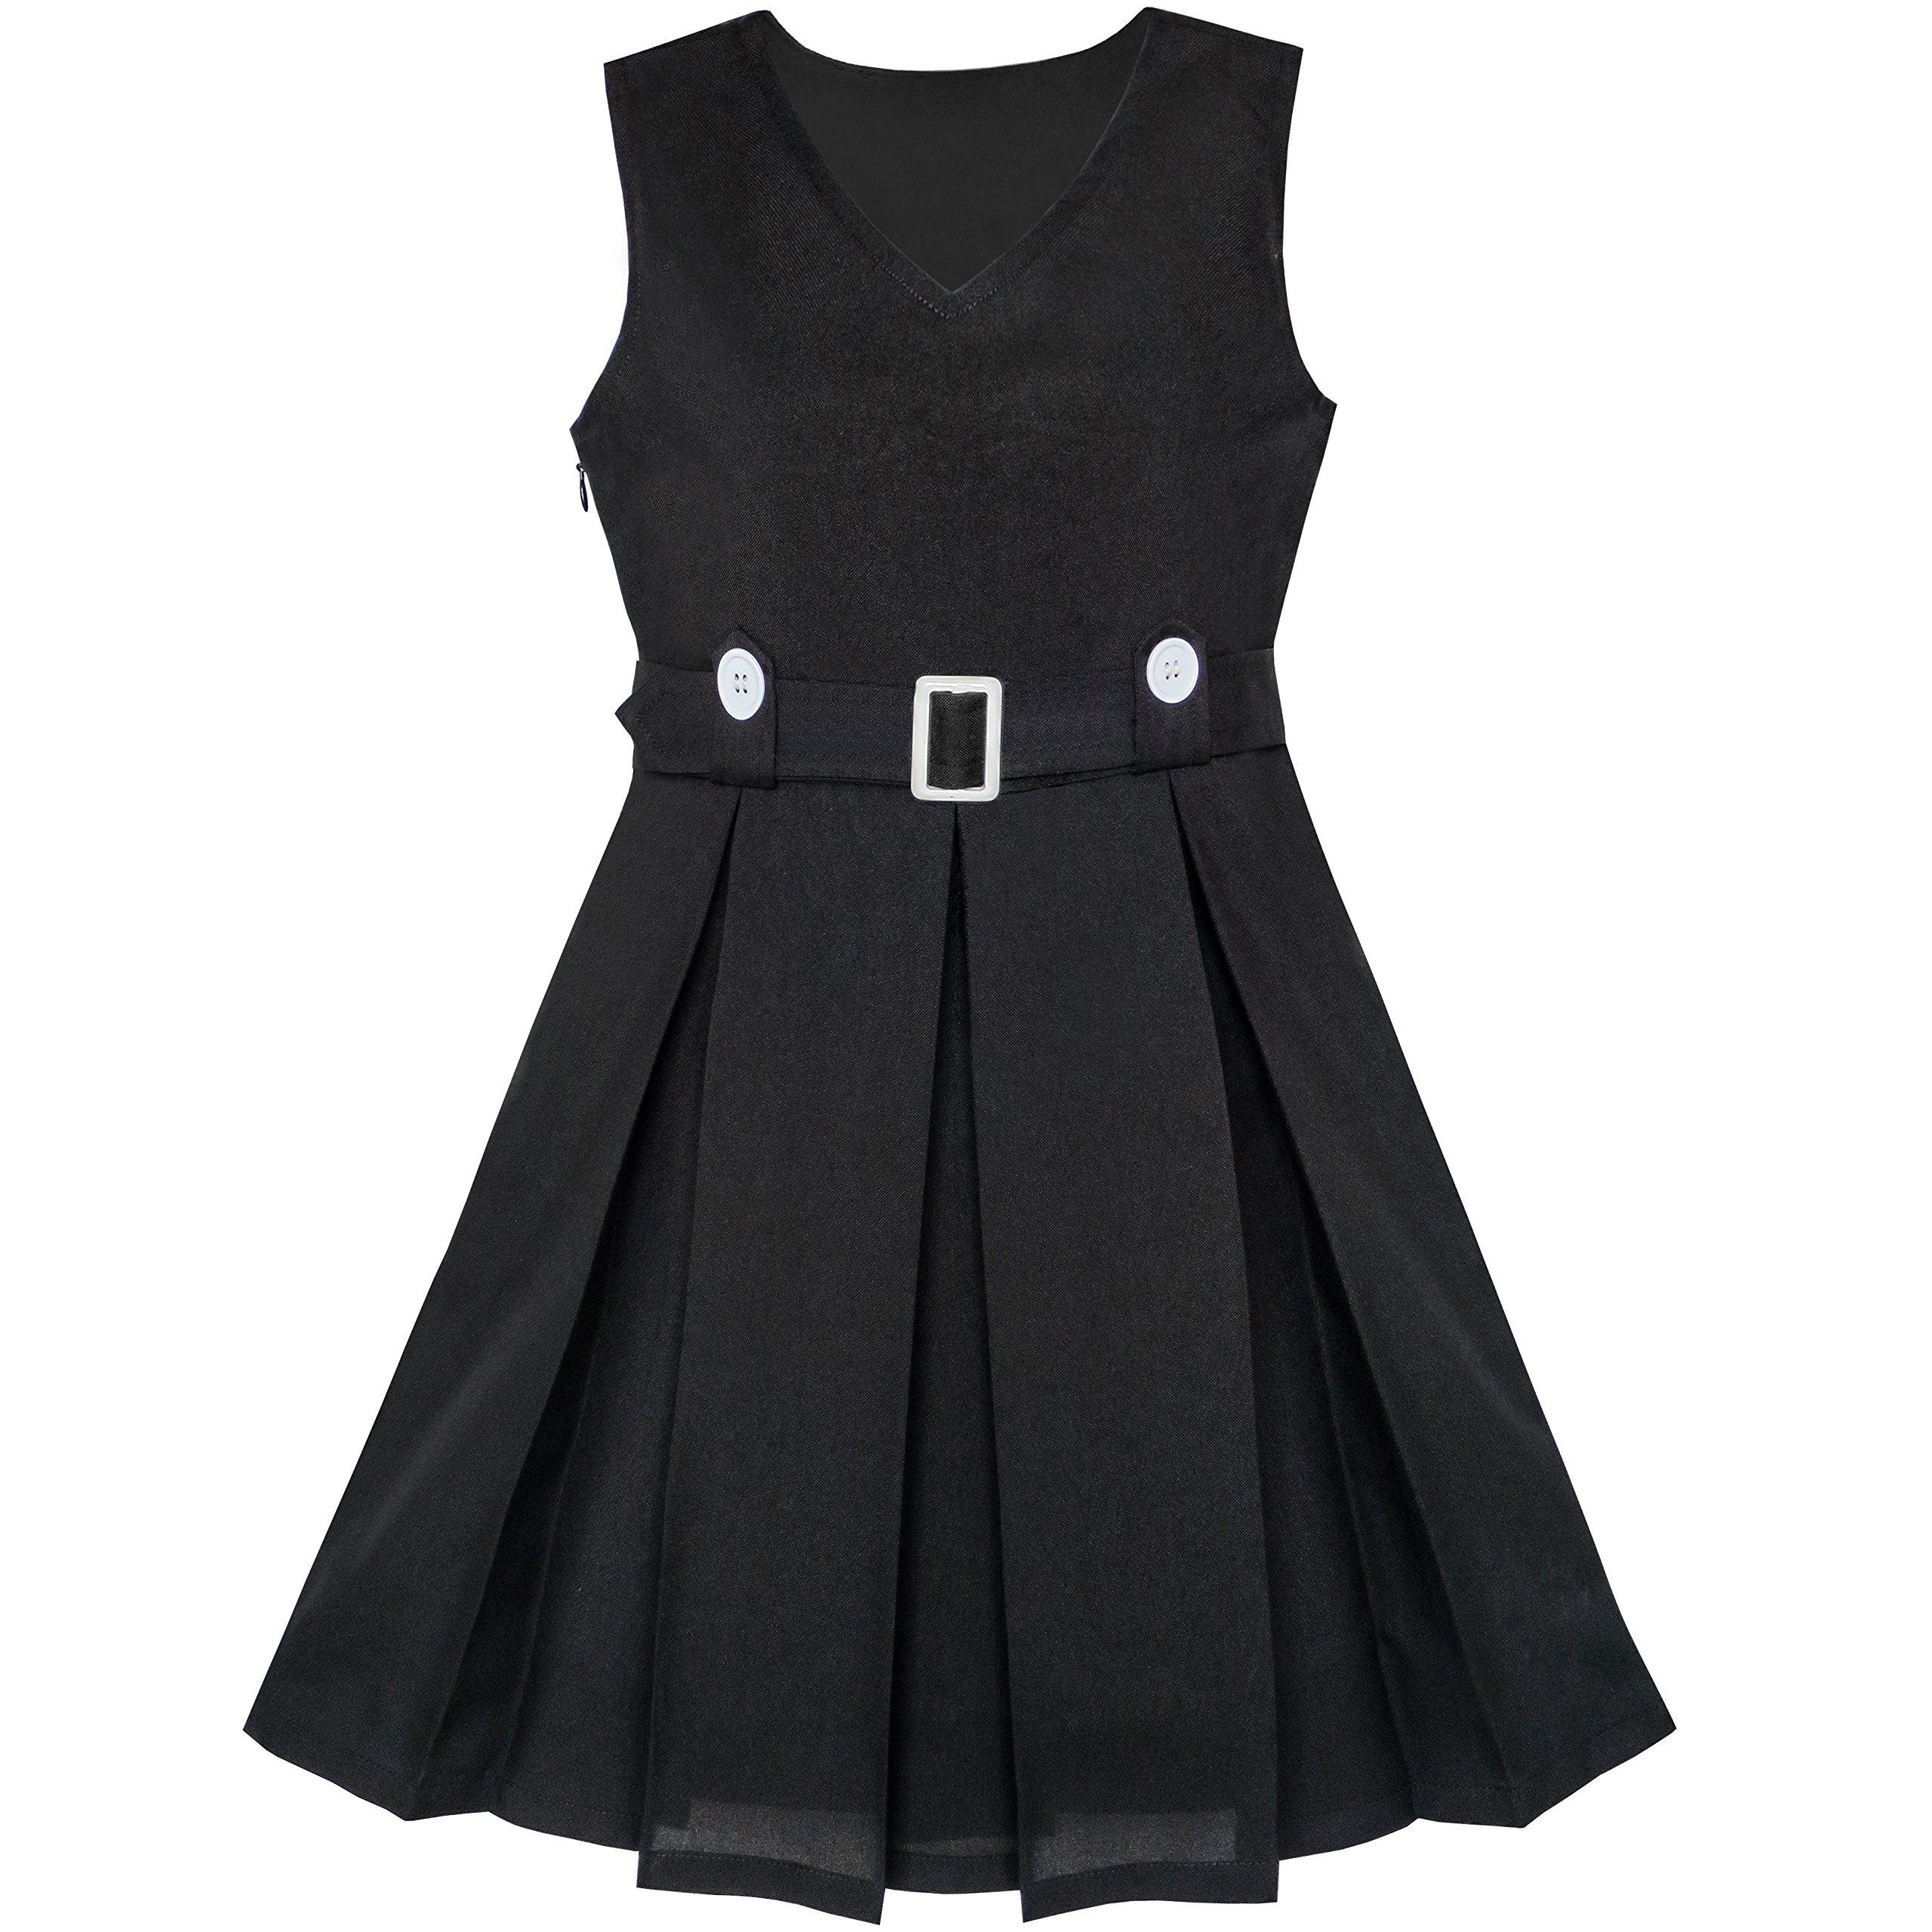 LA16 Girls Dress Black Button Back School Pleated Hem Size 14